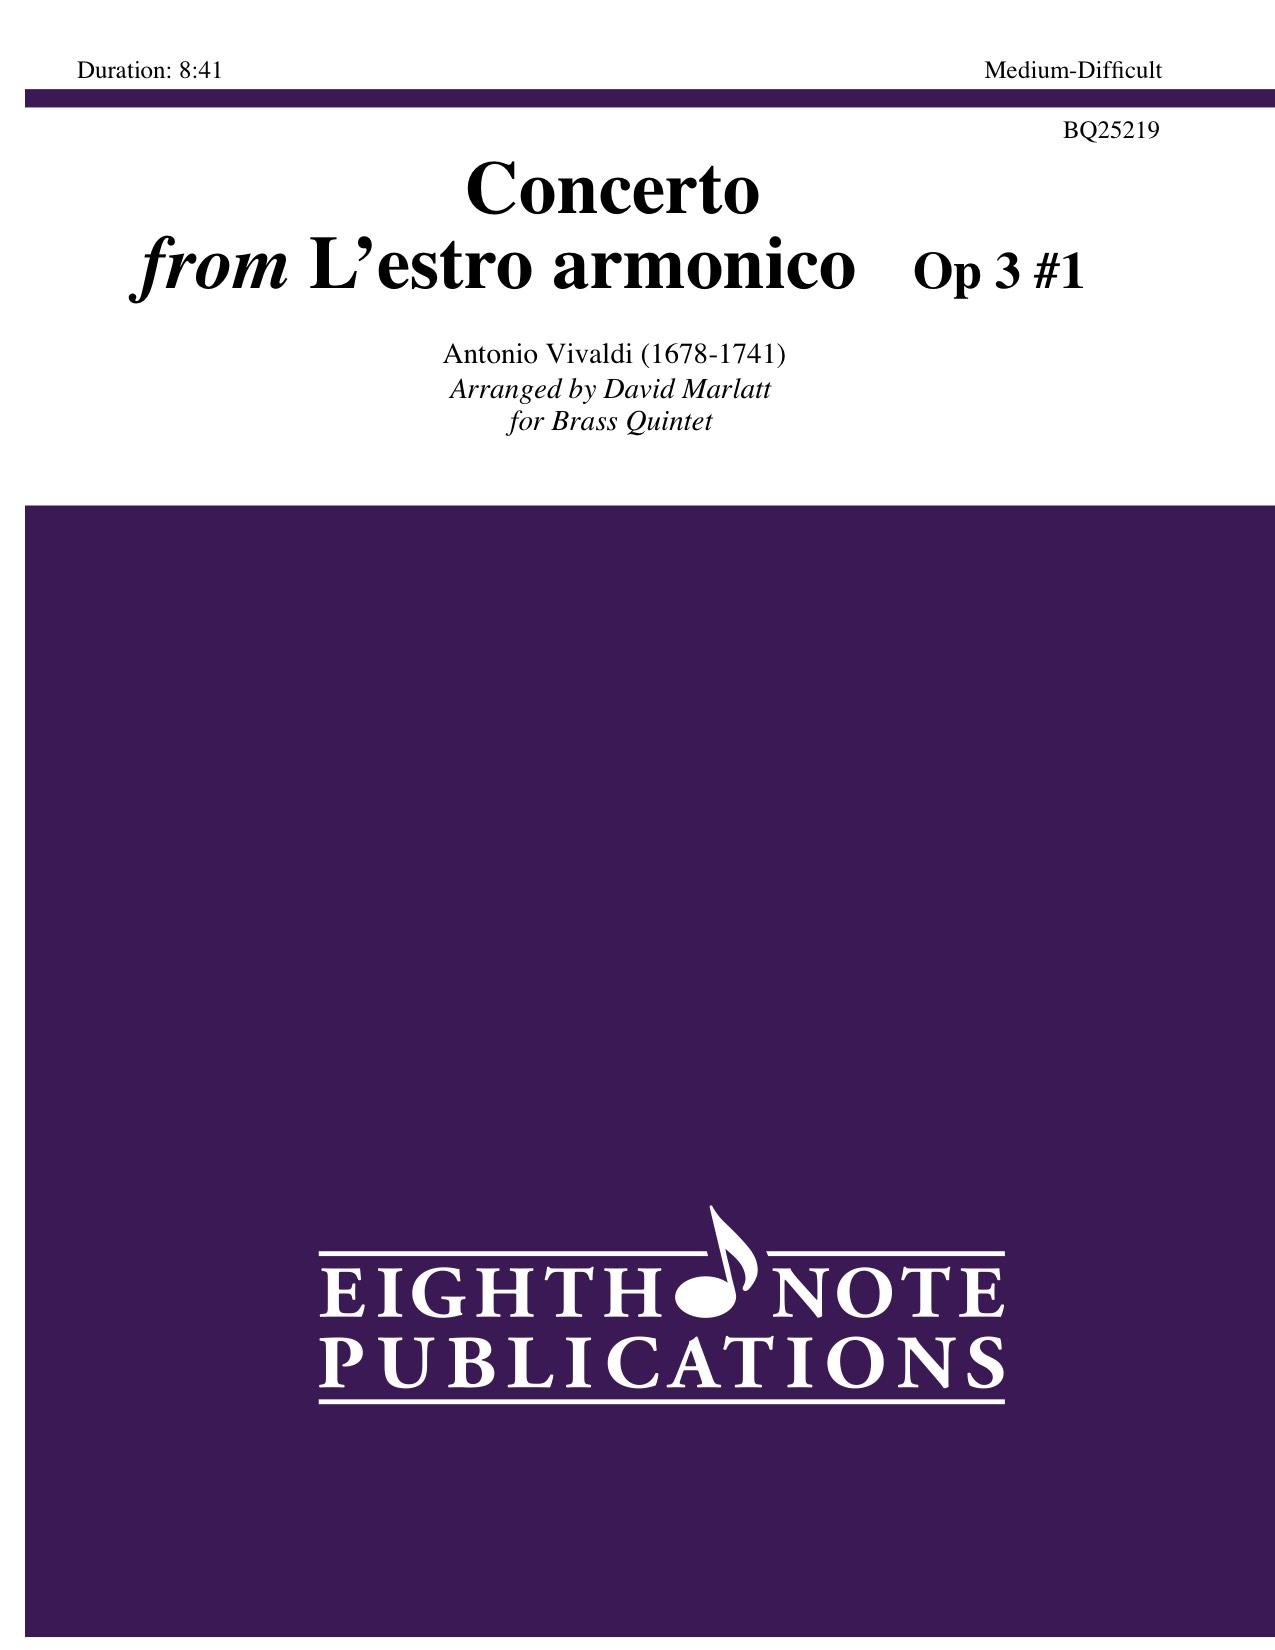 Concerto from Lestro armonico Op 3 #1  -